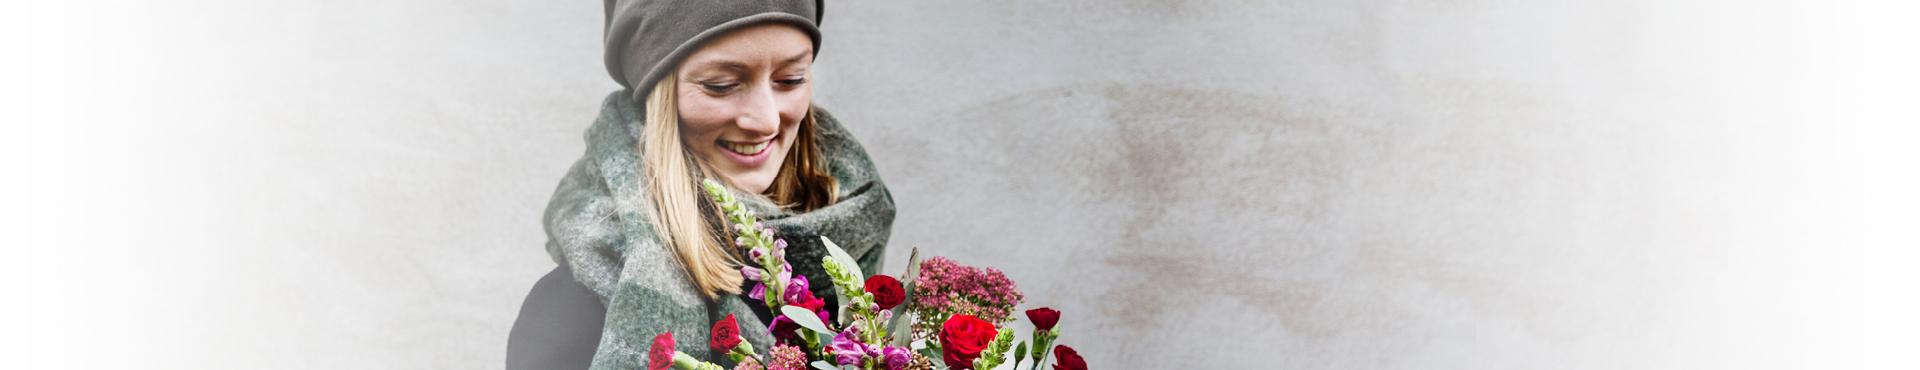 Blomsterinspiration